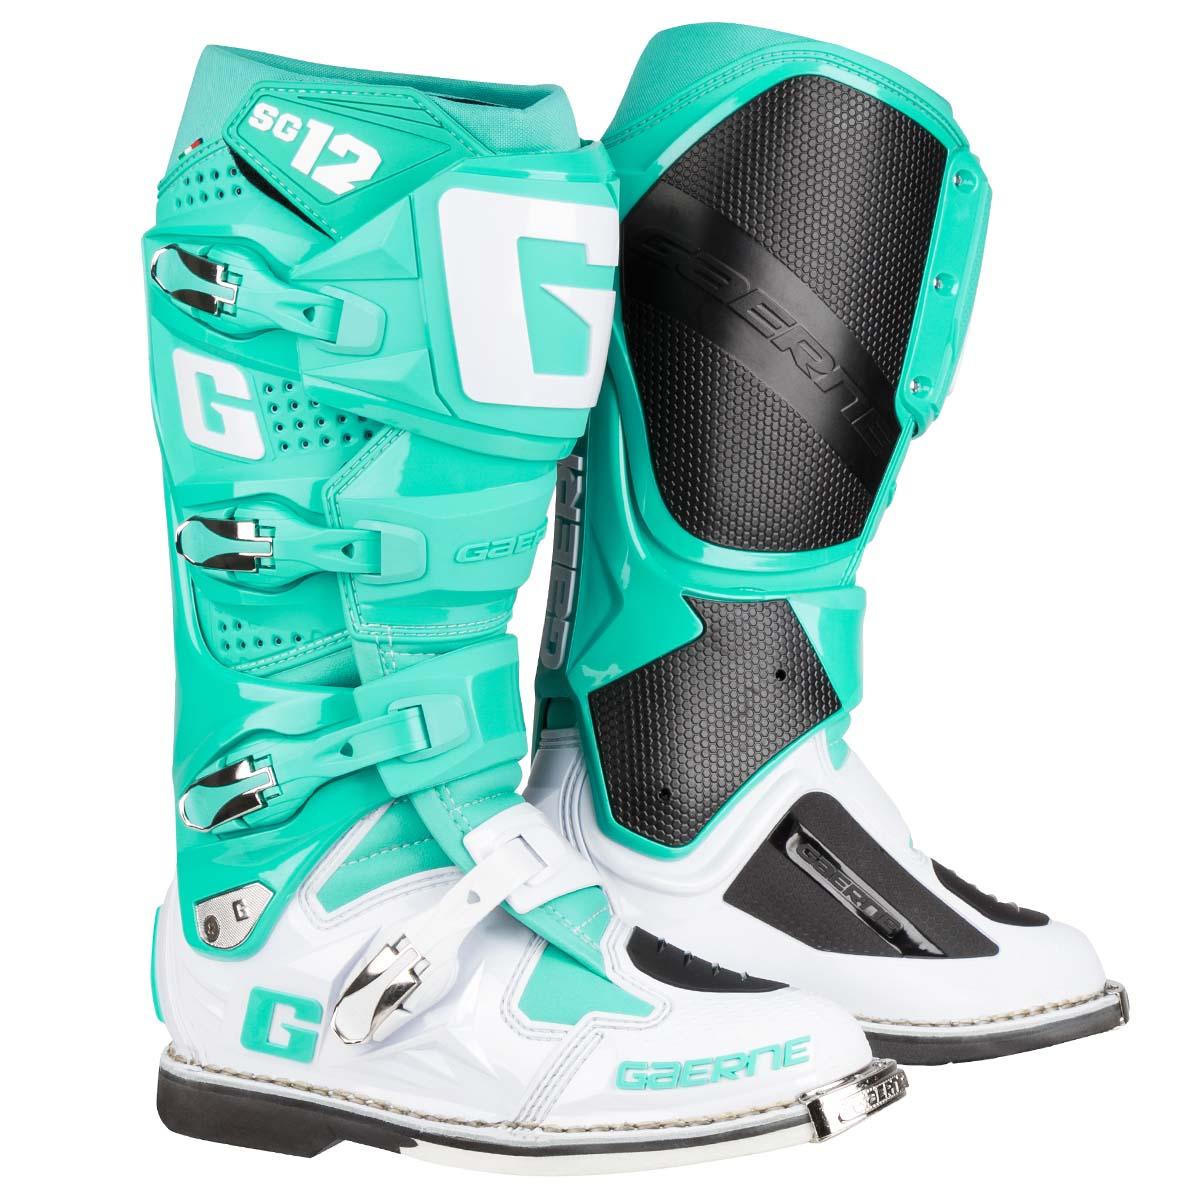 Gaerne Boots Sg12 >> Gaerne MX Boots SG 12 Aqua - Special Edition | Maciag Offroad